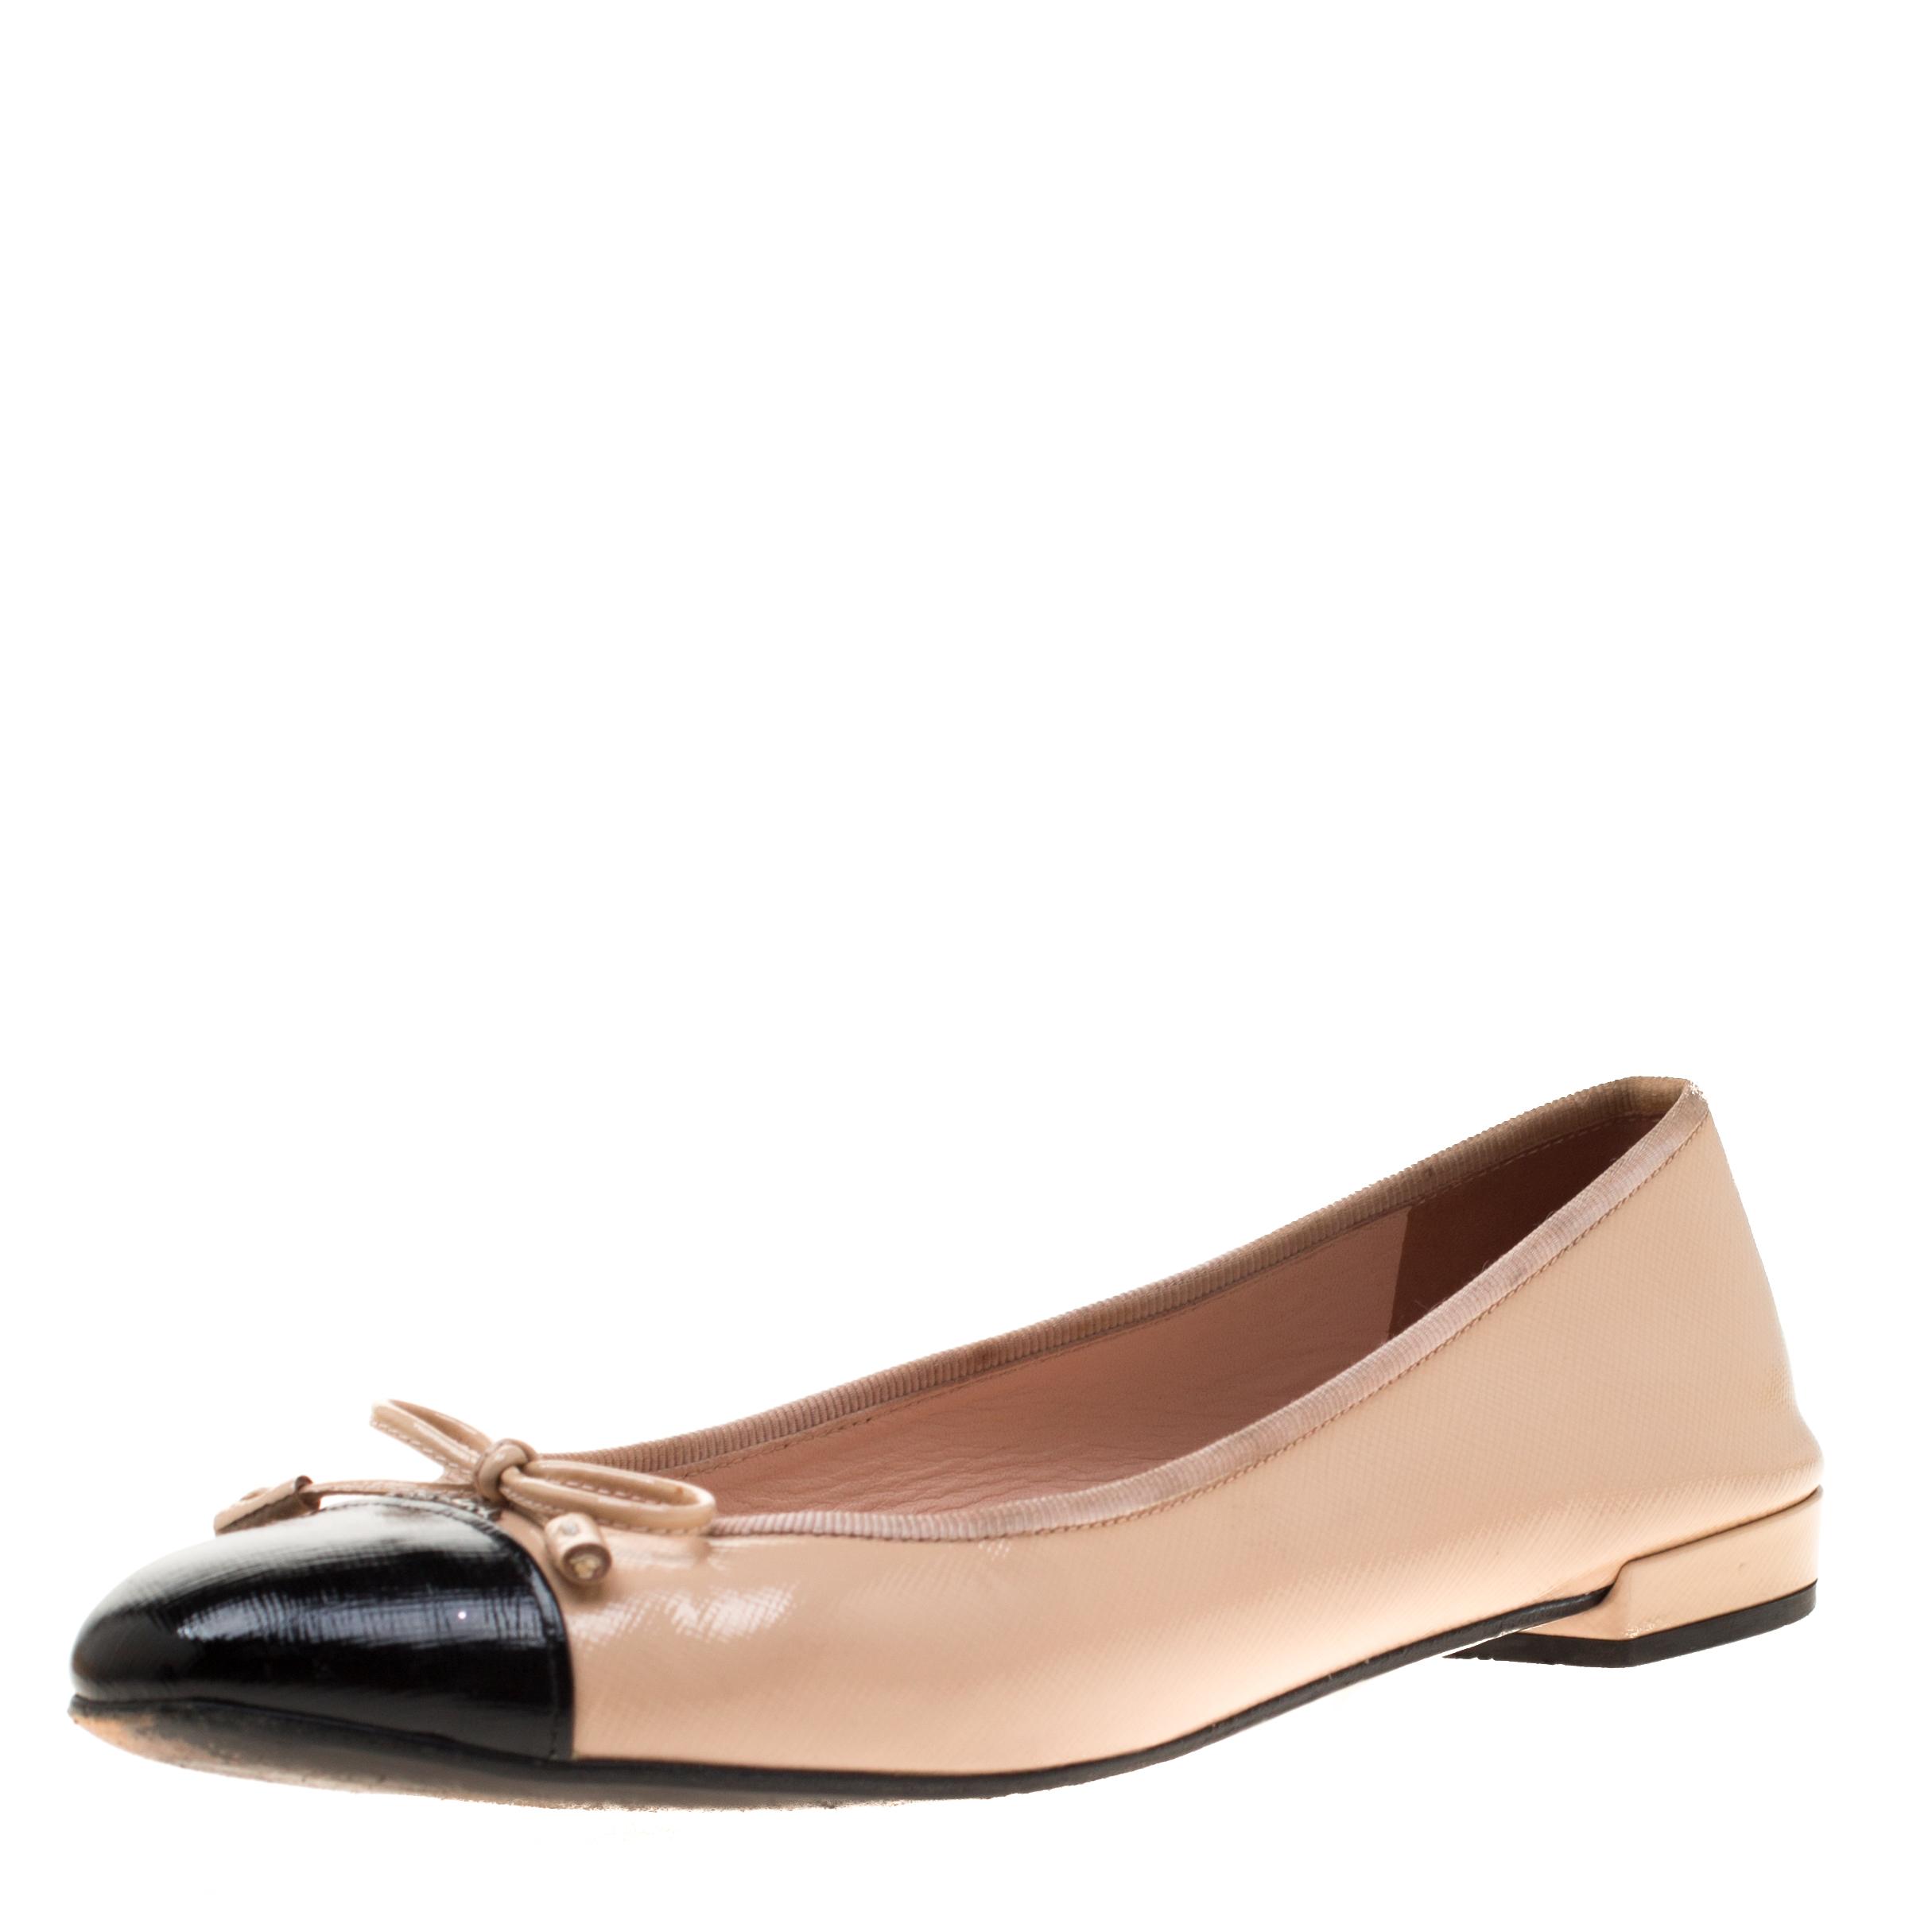 f0e2dd4c6 ... Prada Beige/Black Patent Leather Cap Toe Ballet Flats Size 38.  nextprev. prevnext